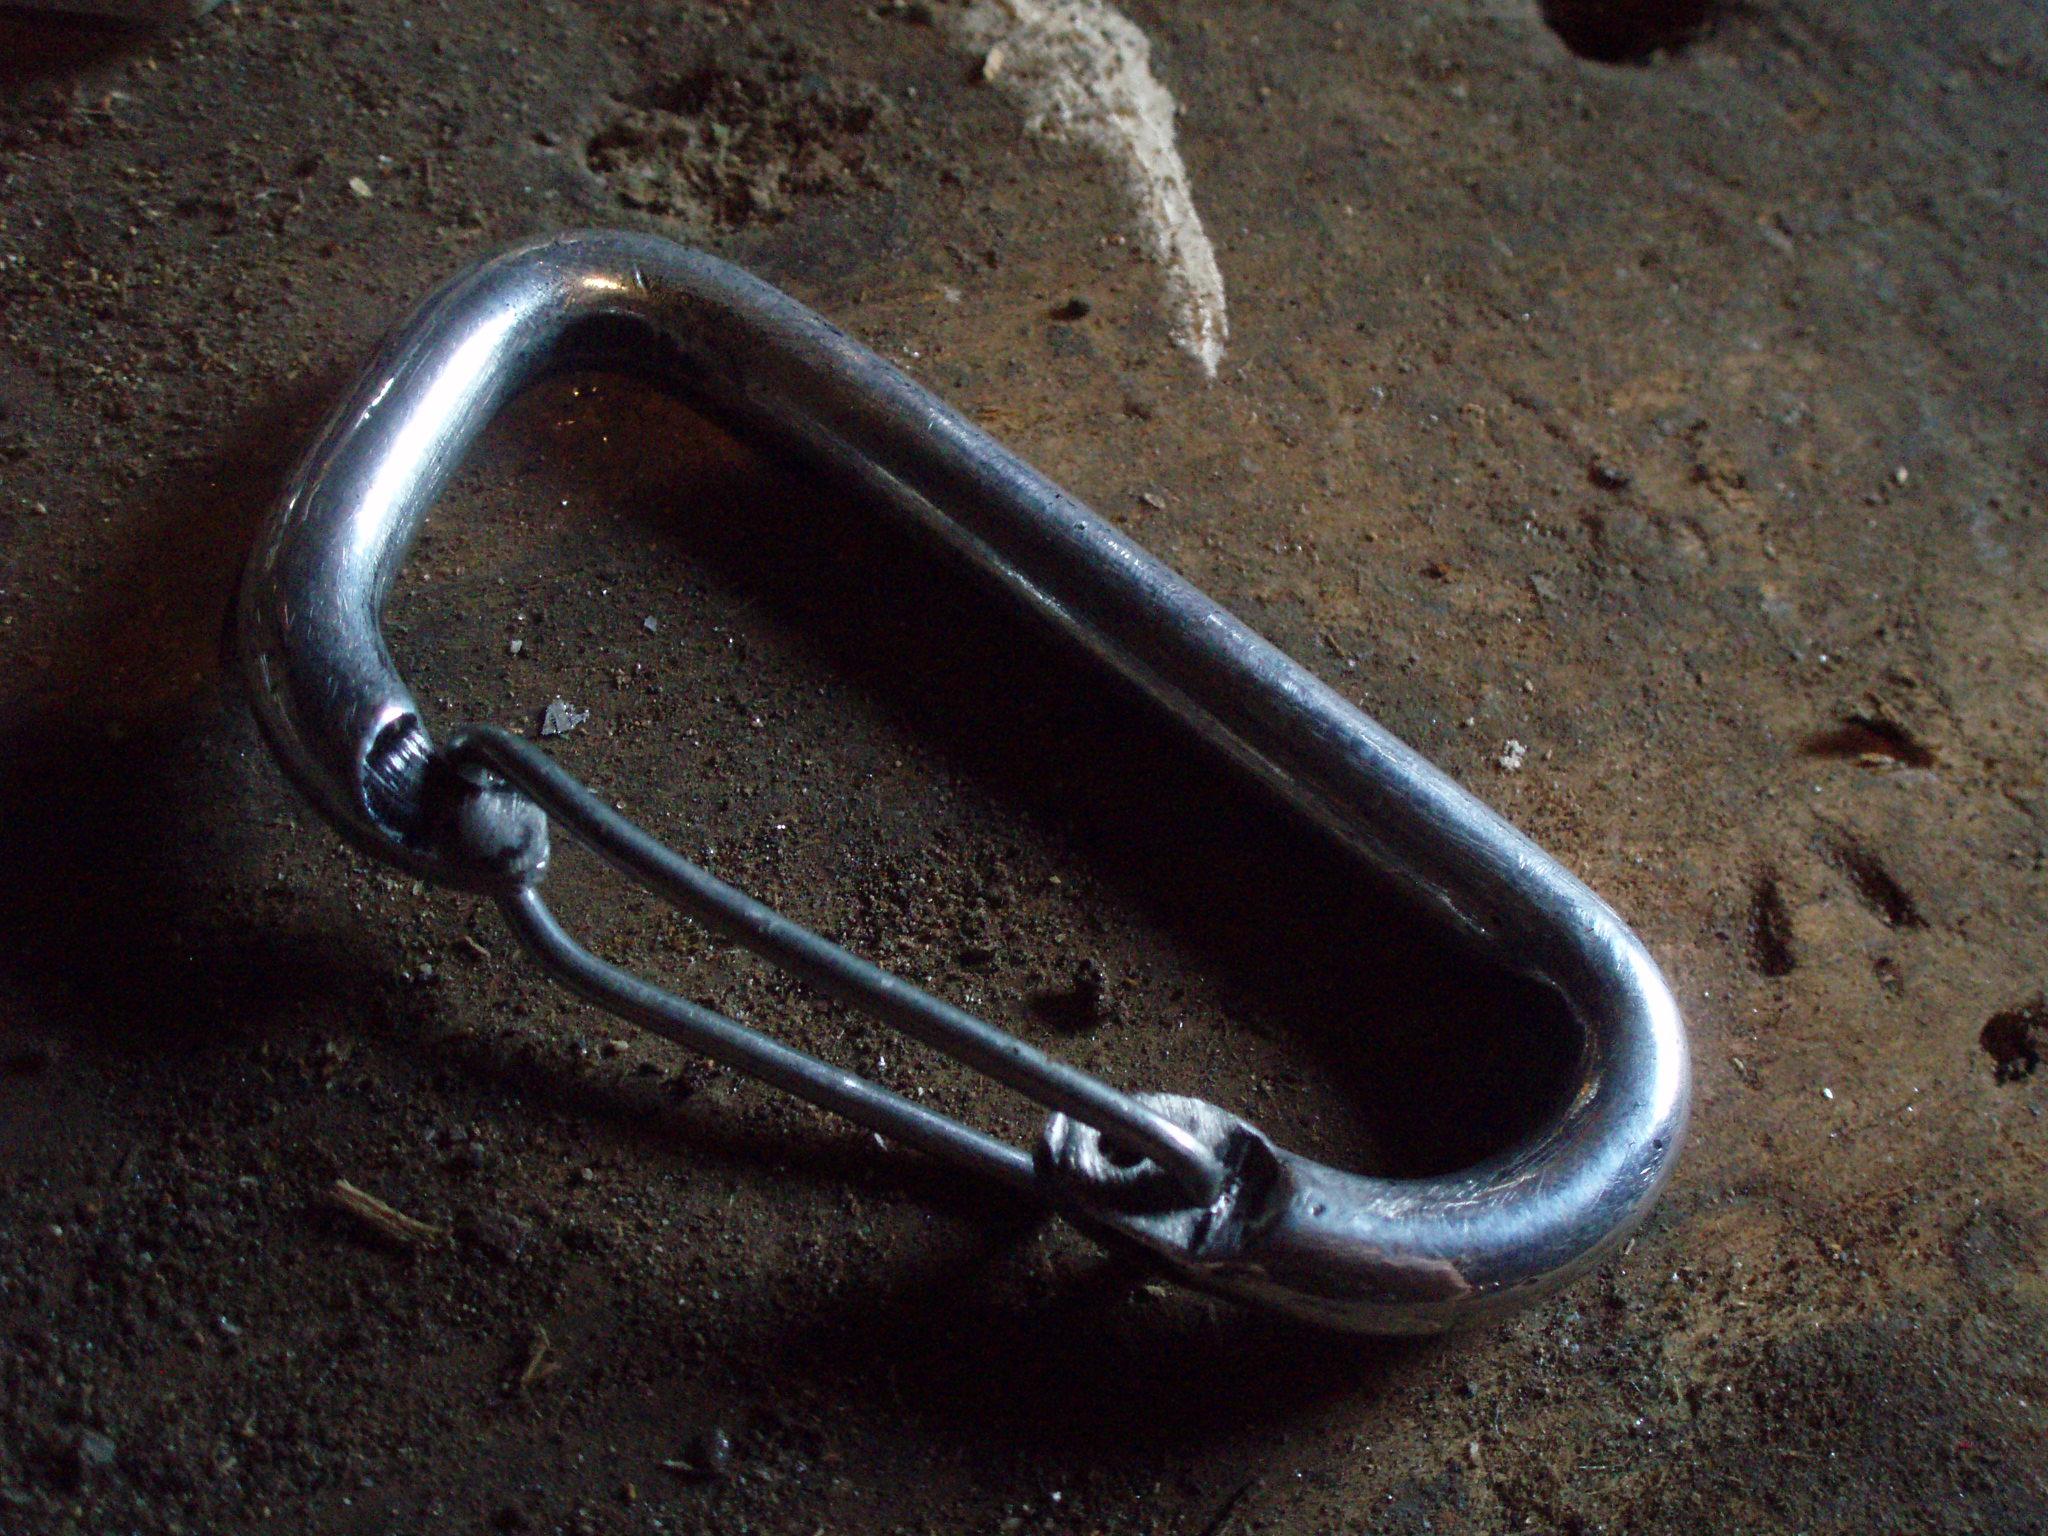 Keychain carabiner: from solidgate to wiregate conversion (De mosqueton cierre solido a alambre)